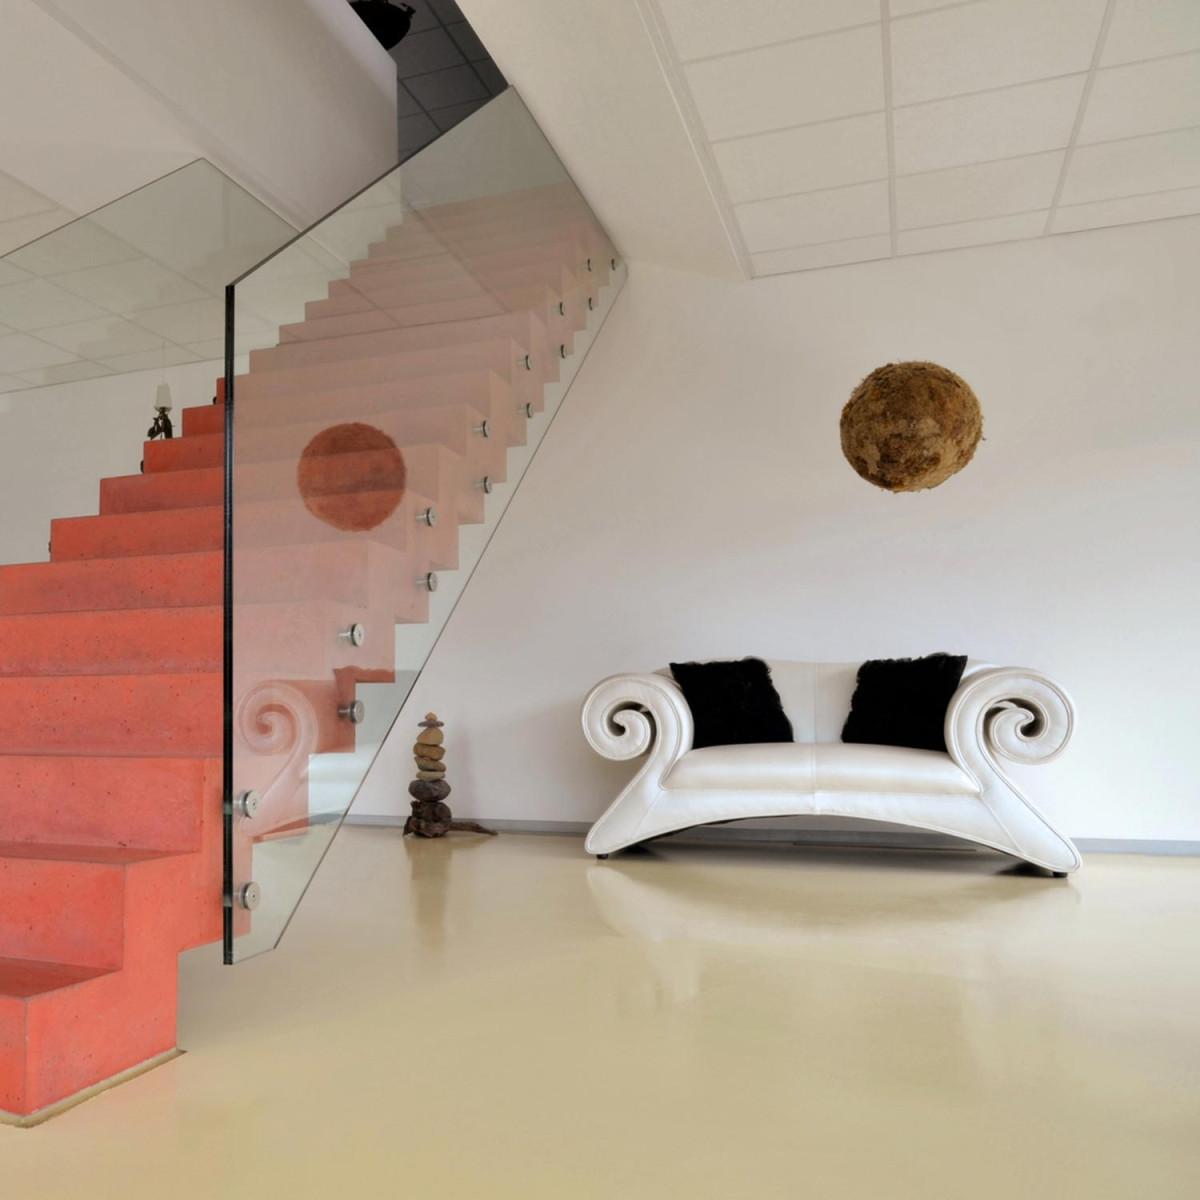 ... Salle De Bains · Resine Peinture Epoxy Revetement Sol · Resine Epoxy Sol  Revetement Chambre Salon Cuisine ...